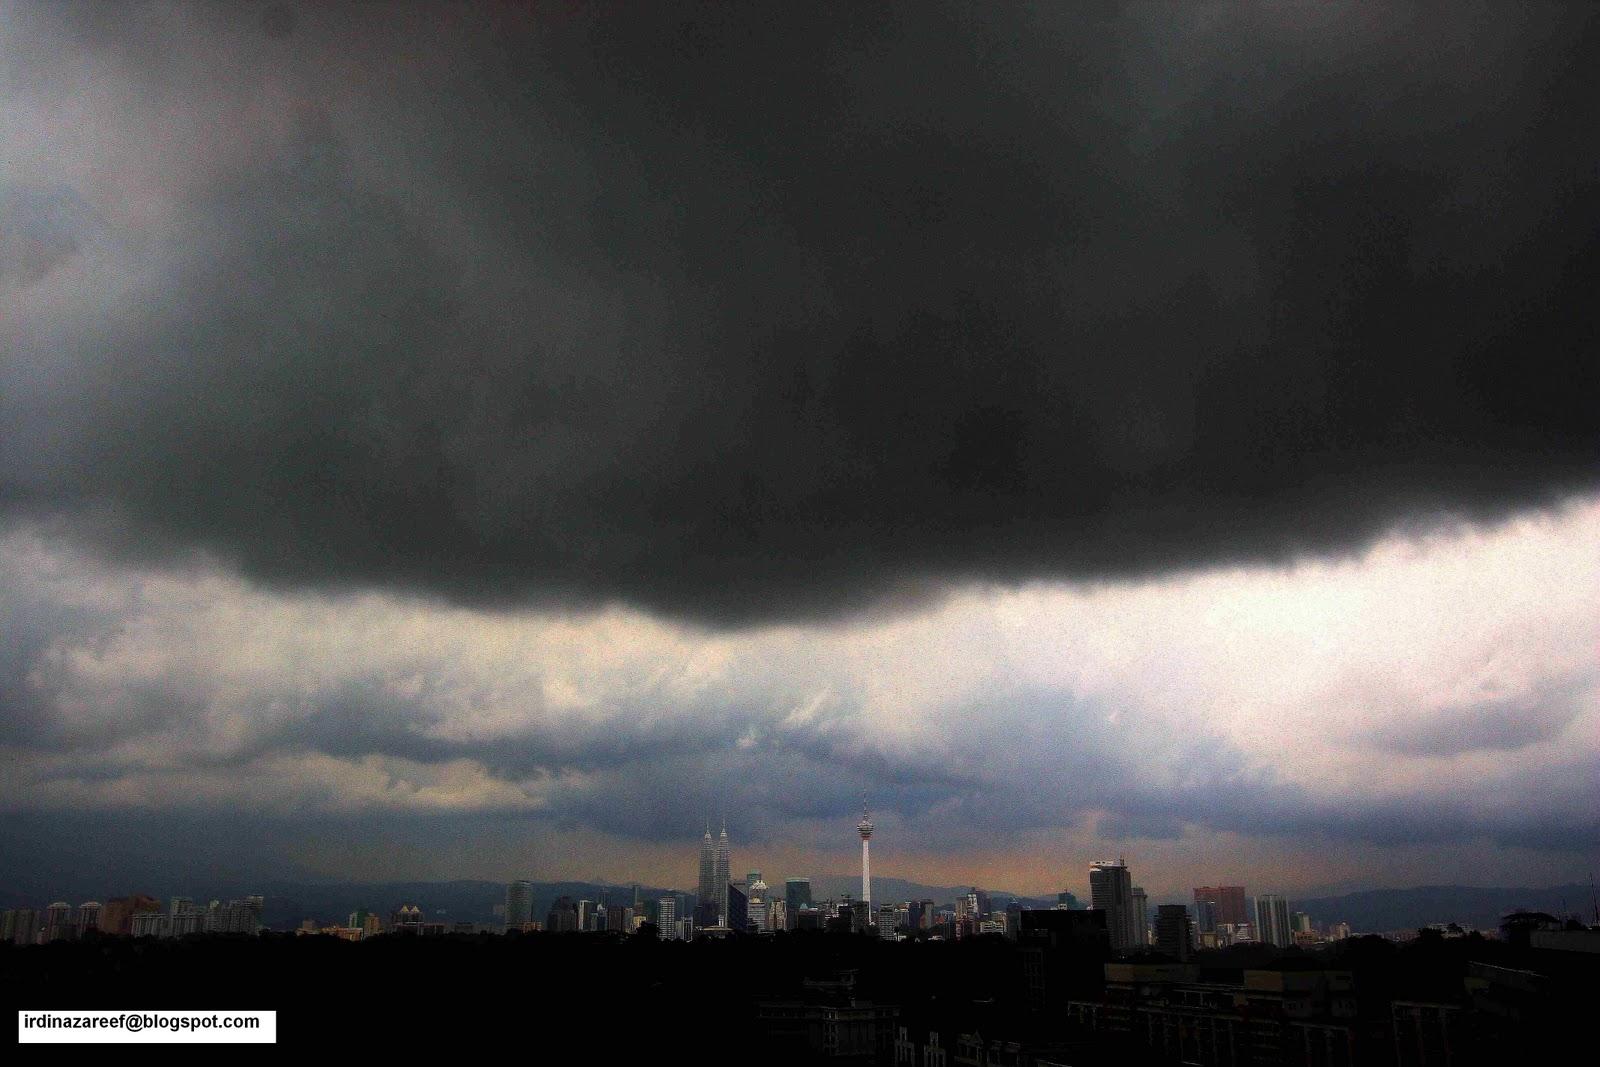 IrdinaZareef Gambar awan penyebab Kajang banjir besar